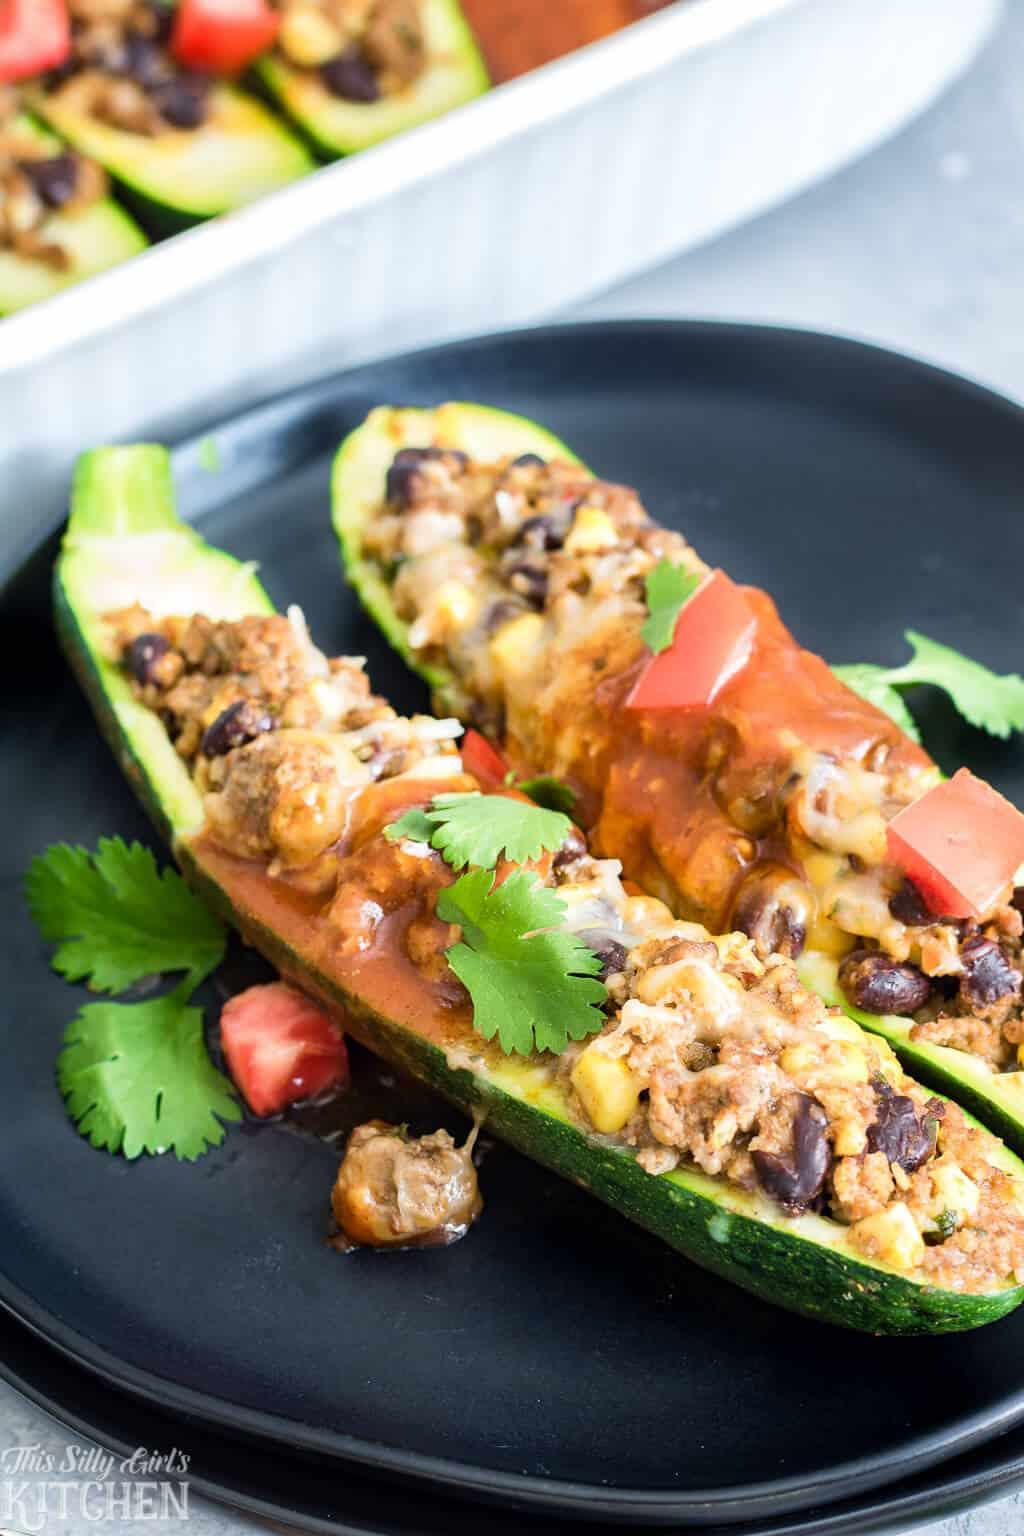 Enchilada Stuffed Zucchini, a satisfying, easy dinner the whole family will love! #Recipe from ThisSillyGirlsKitchen.com #Enchilada #StuffedZucchini